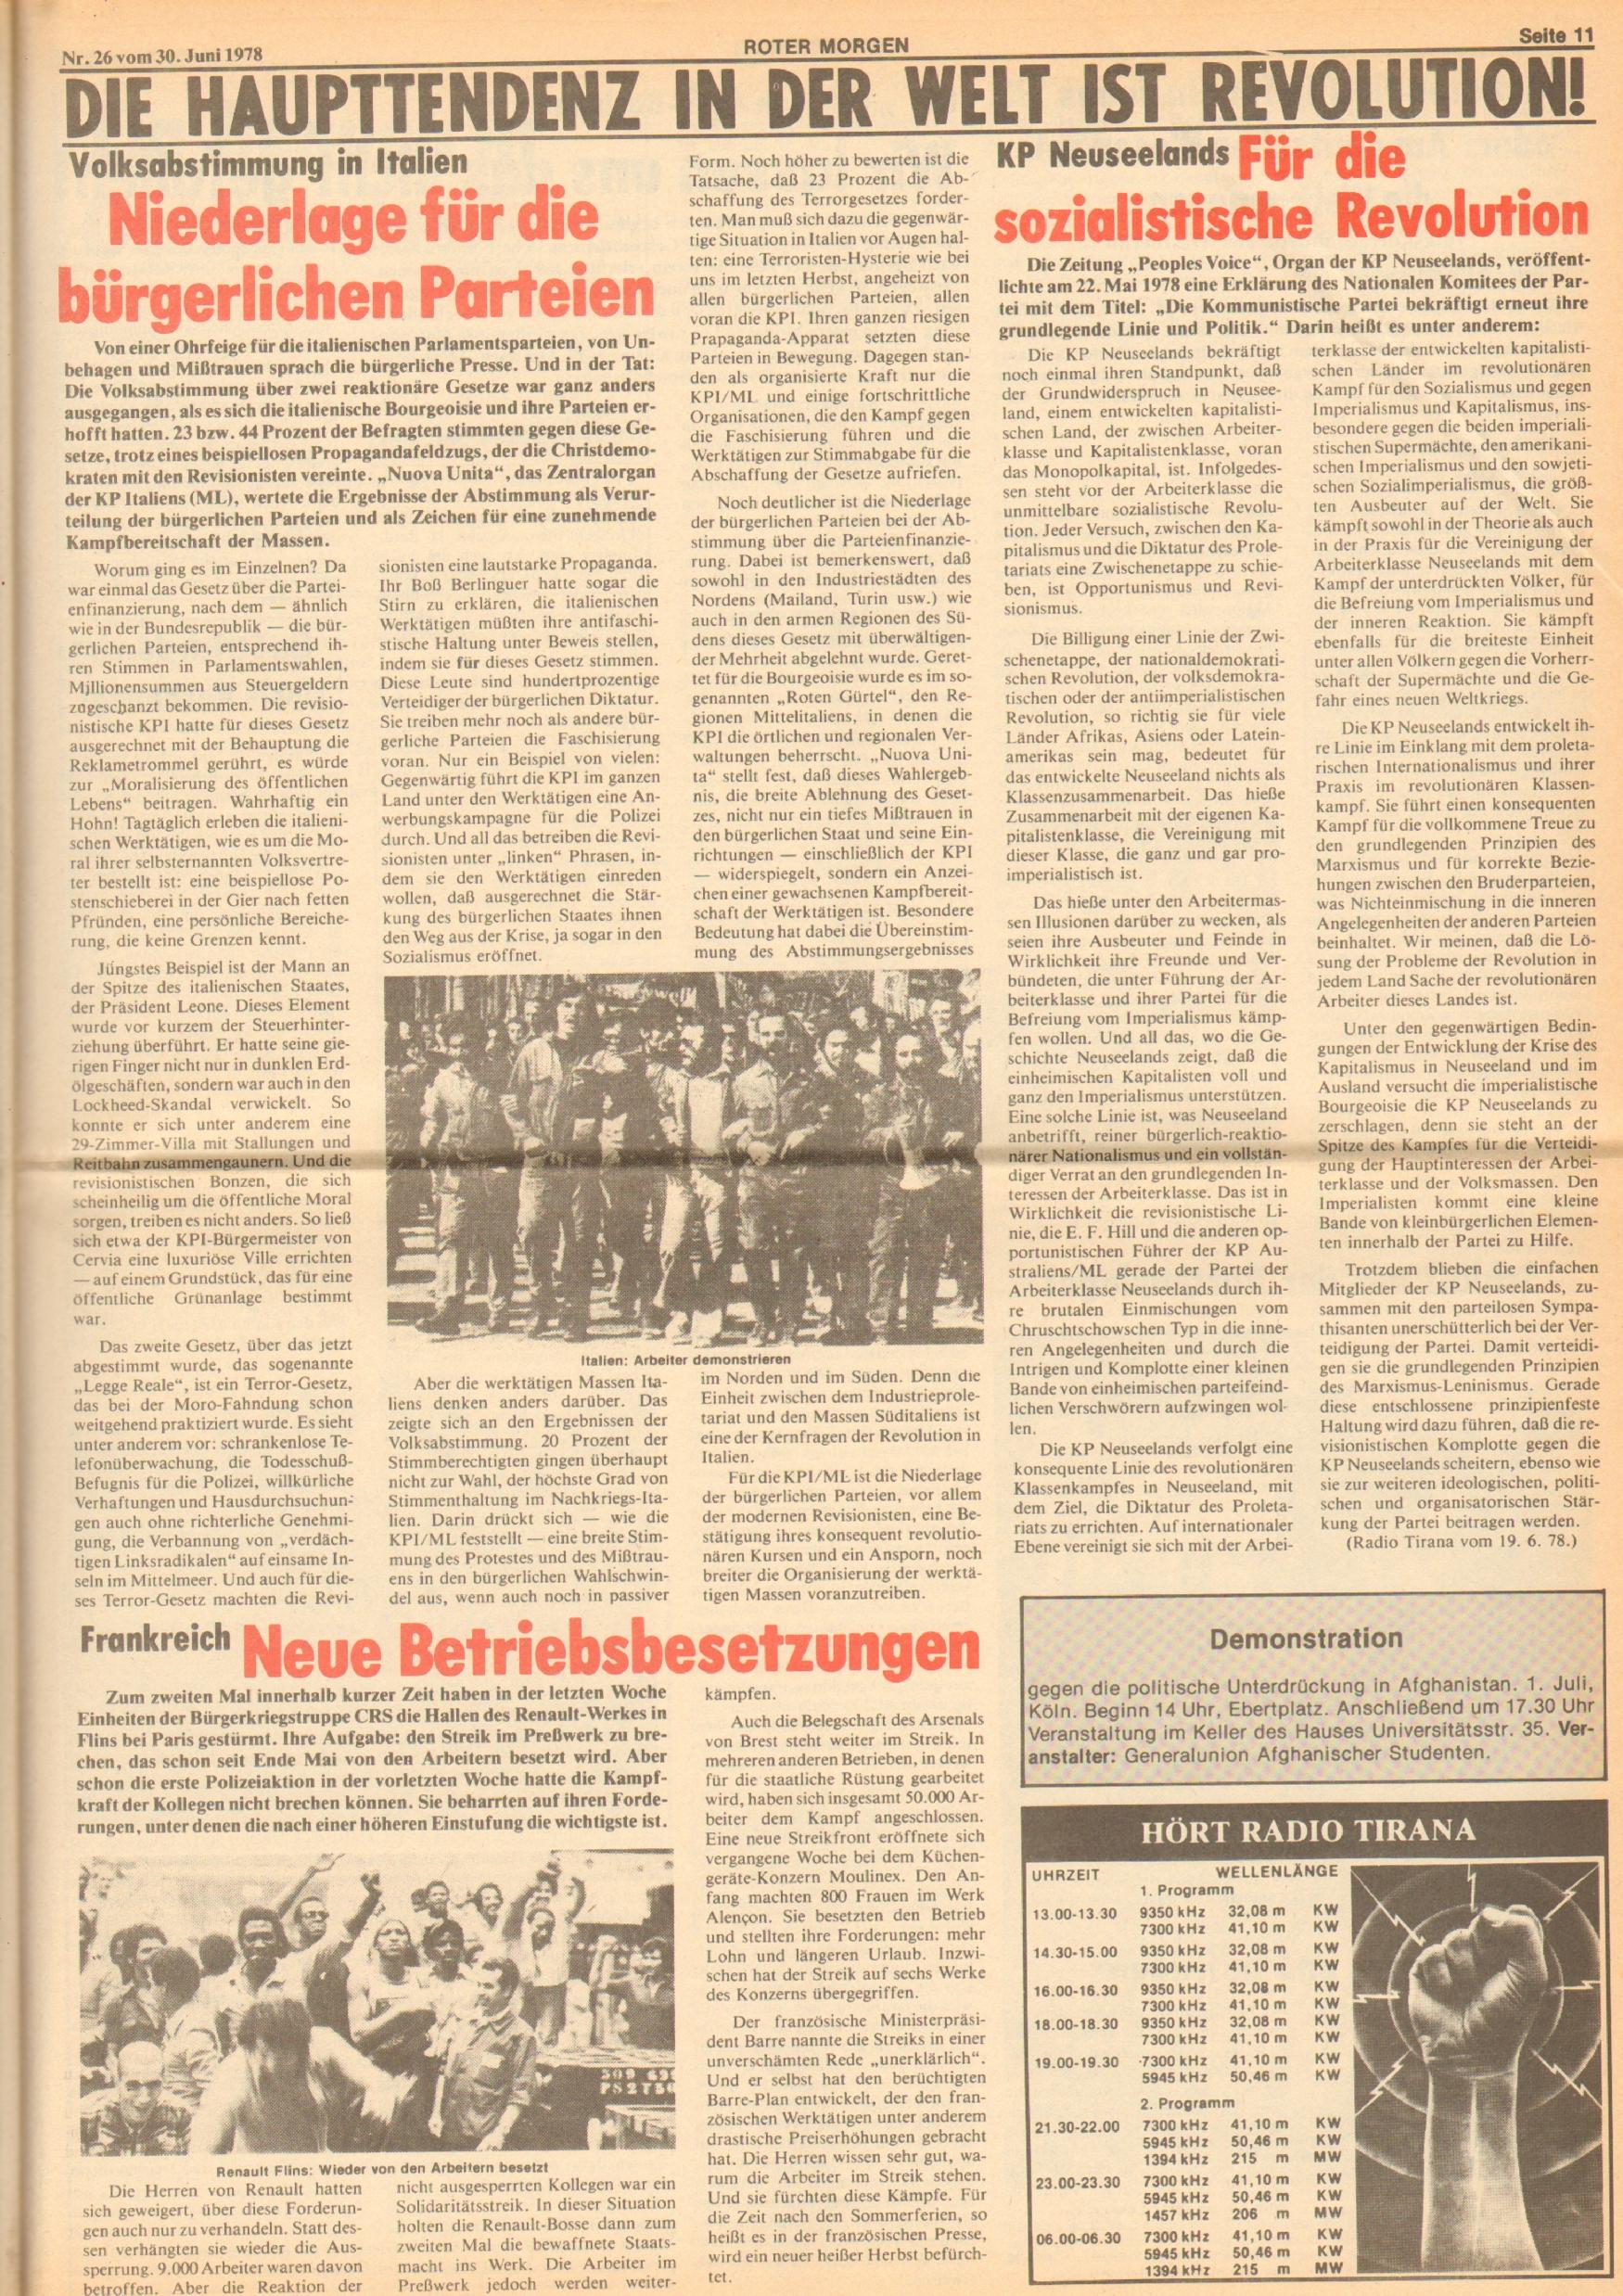 Roter Morgen, 12. Jg., 30. Juni 1978, Nr. 26, Seite 11